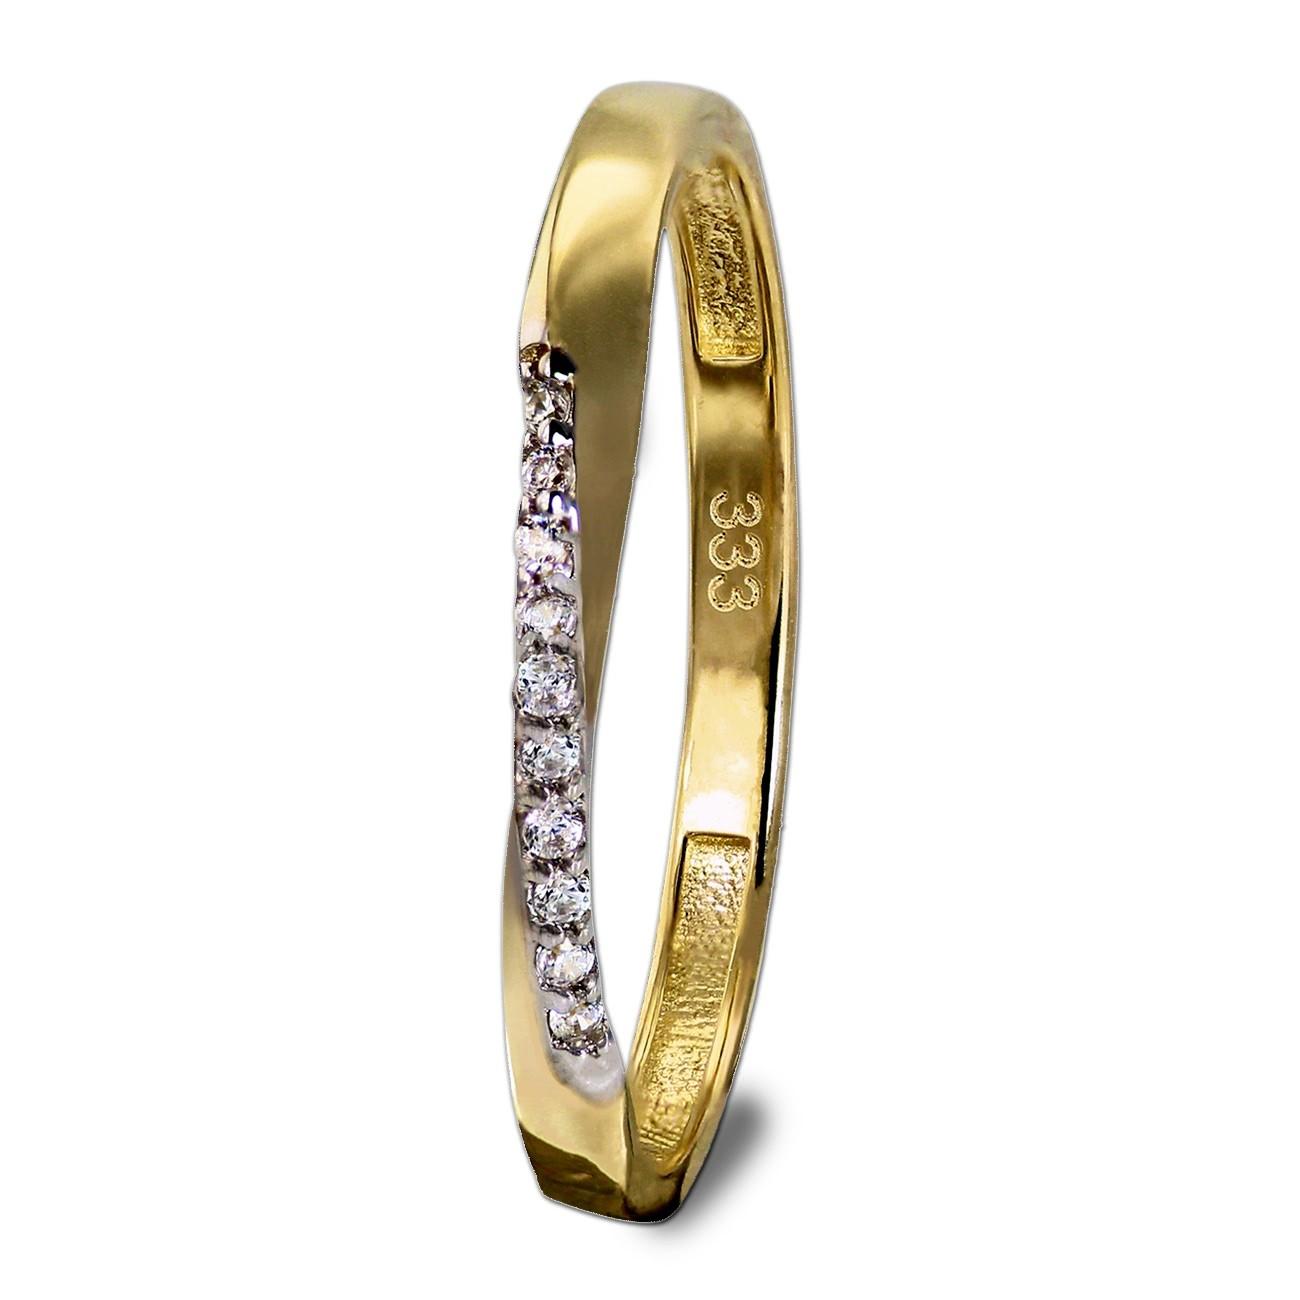 GoldDream Gold Ring Gr.56 Swing Zirkonia weiß 333er Gelbgold GDR523Y56